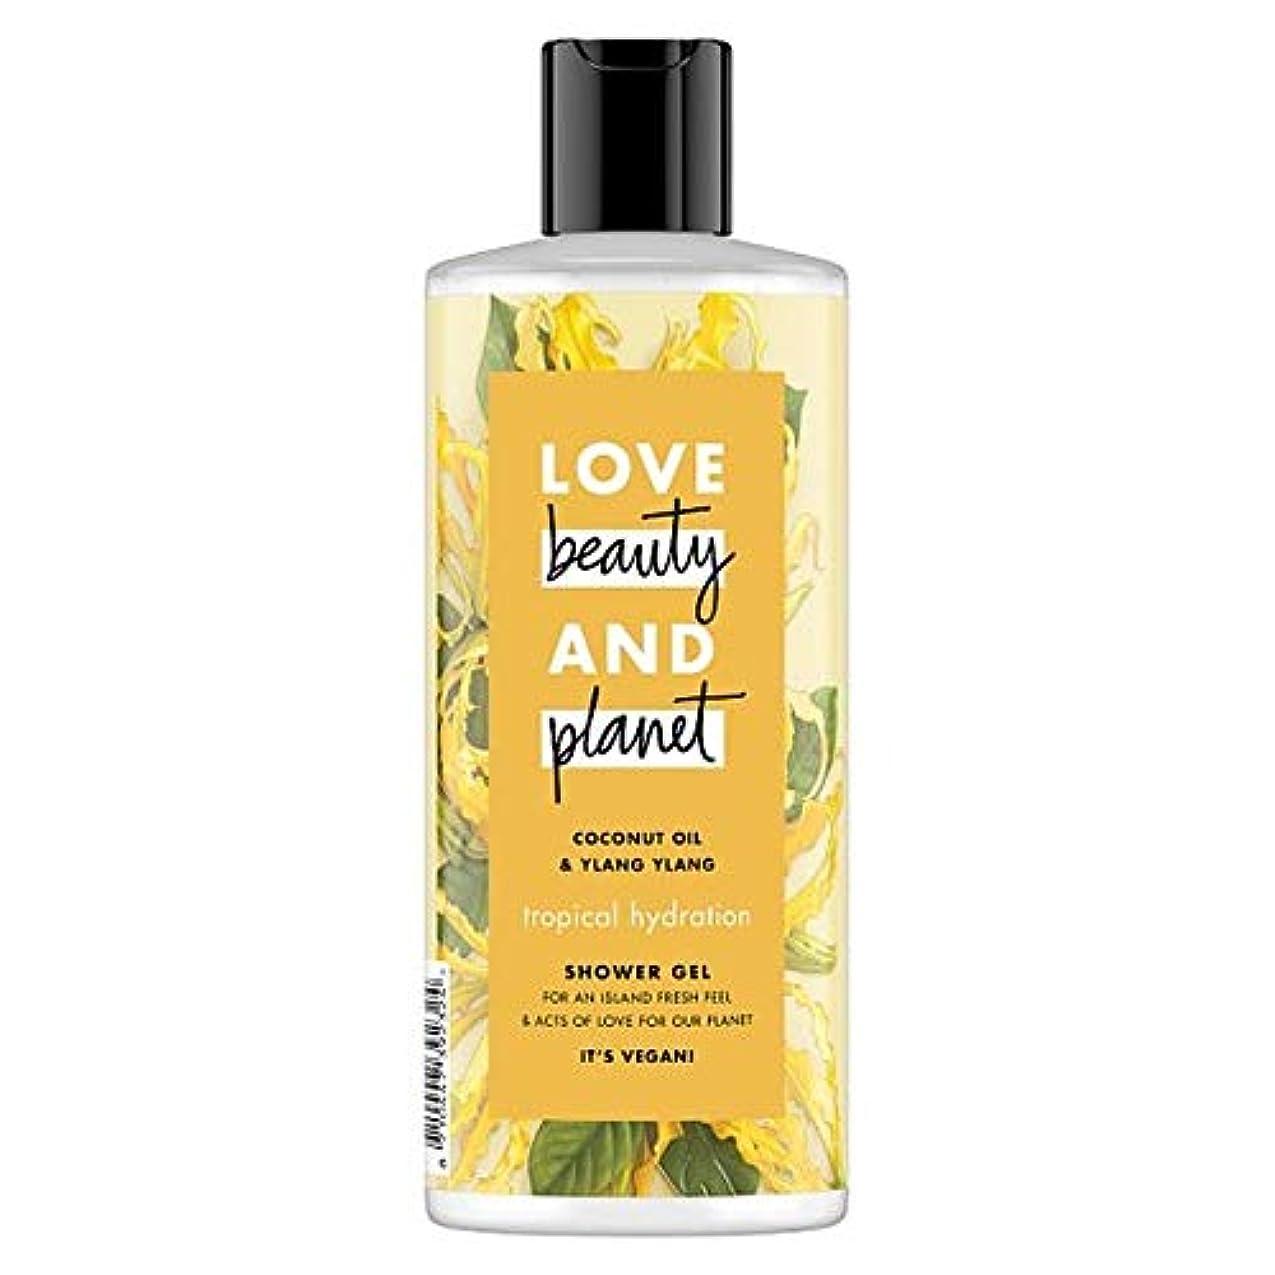 [Dove ] 美しさと惑星イランのシャワージェル500ミリリットルを愛します - Love Beauty And Planet Ylang Shower Gel 500Ml [並行輸入品]